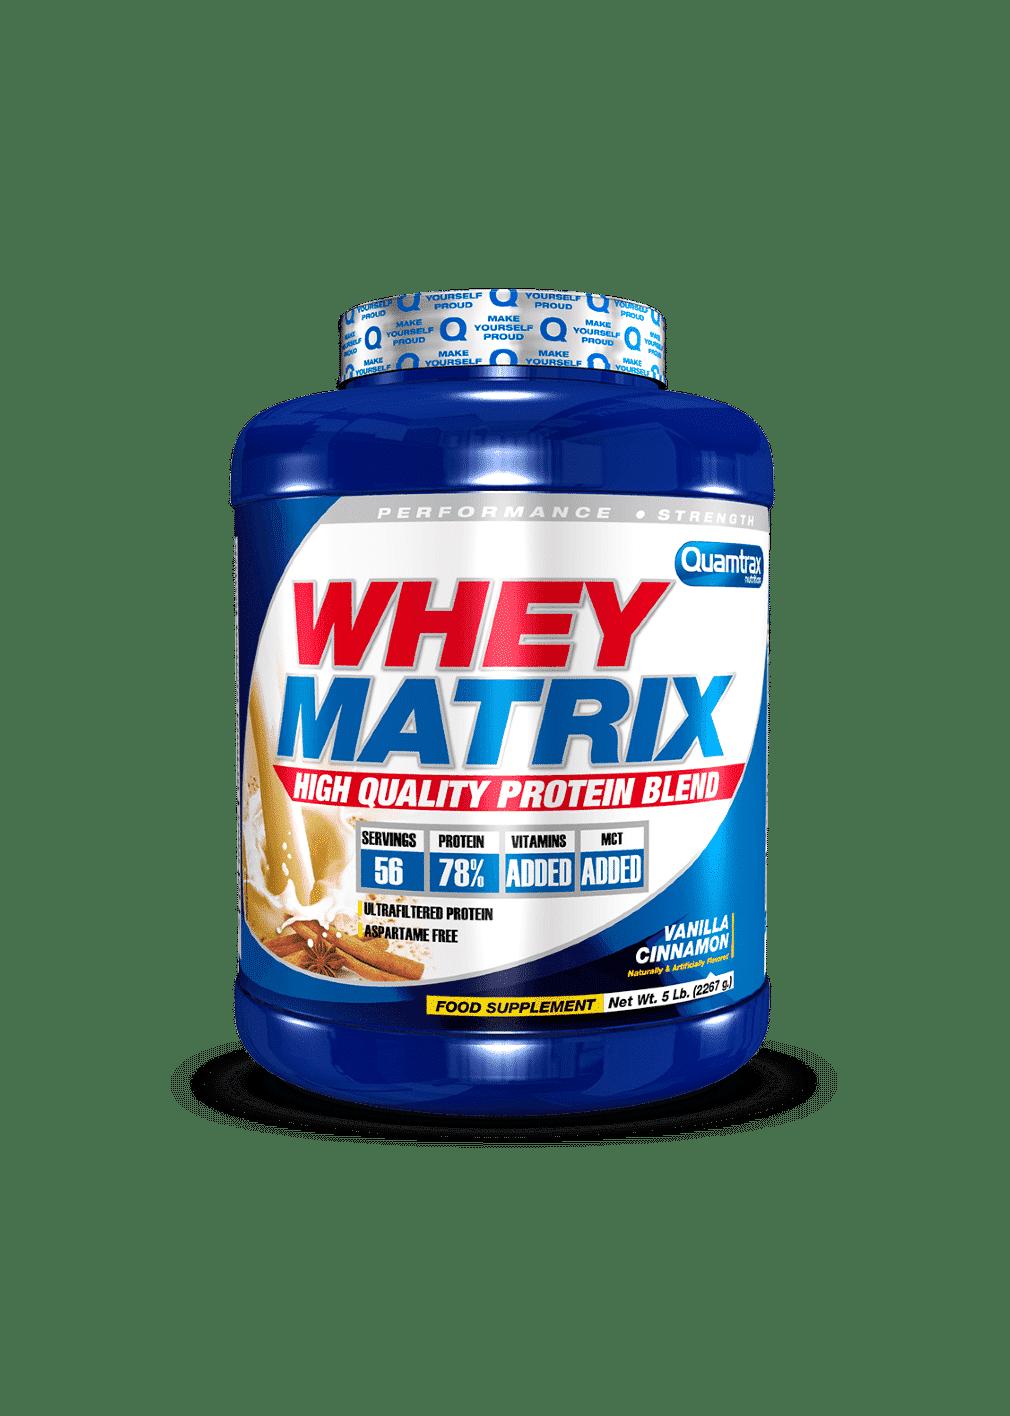 (Quamtrax) Proteina Whey Matrix de 2,267 kg vainilla canelapuntfitness